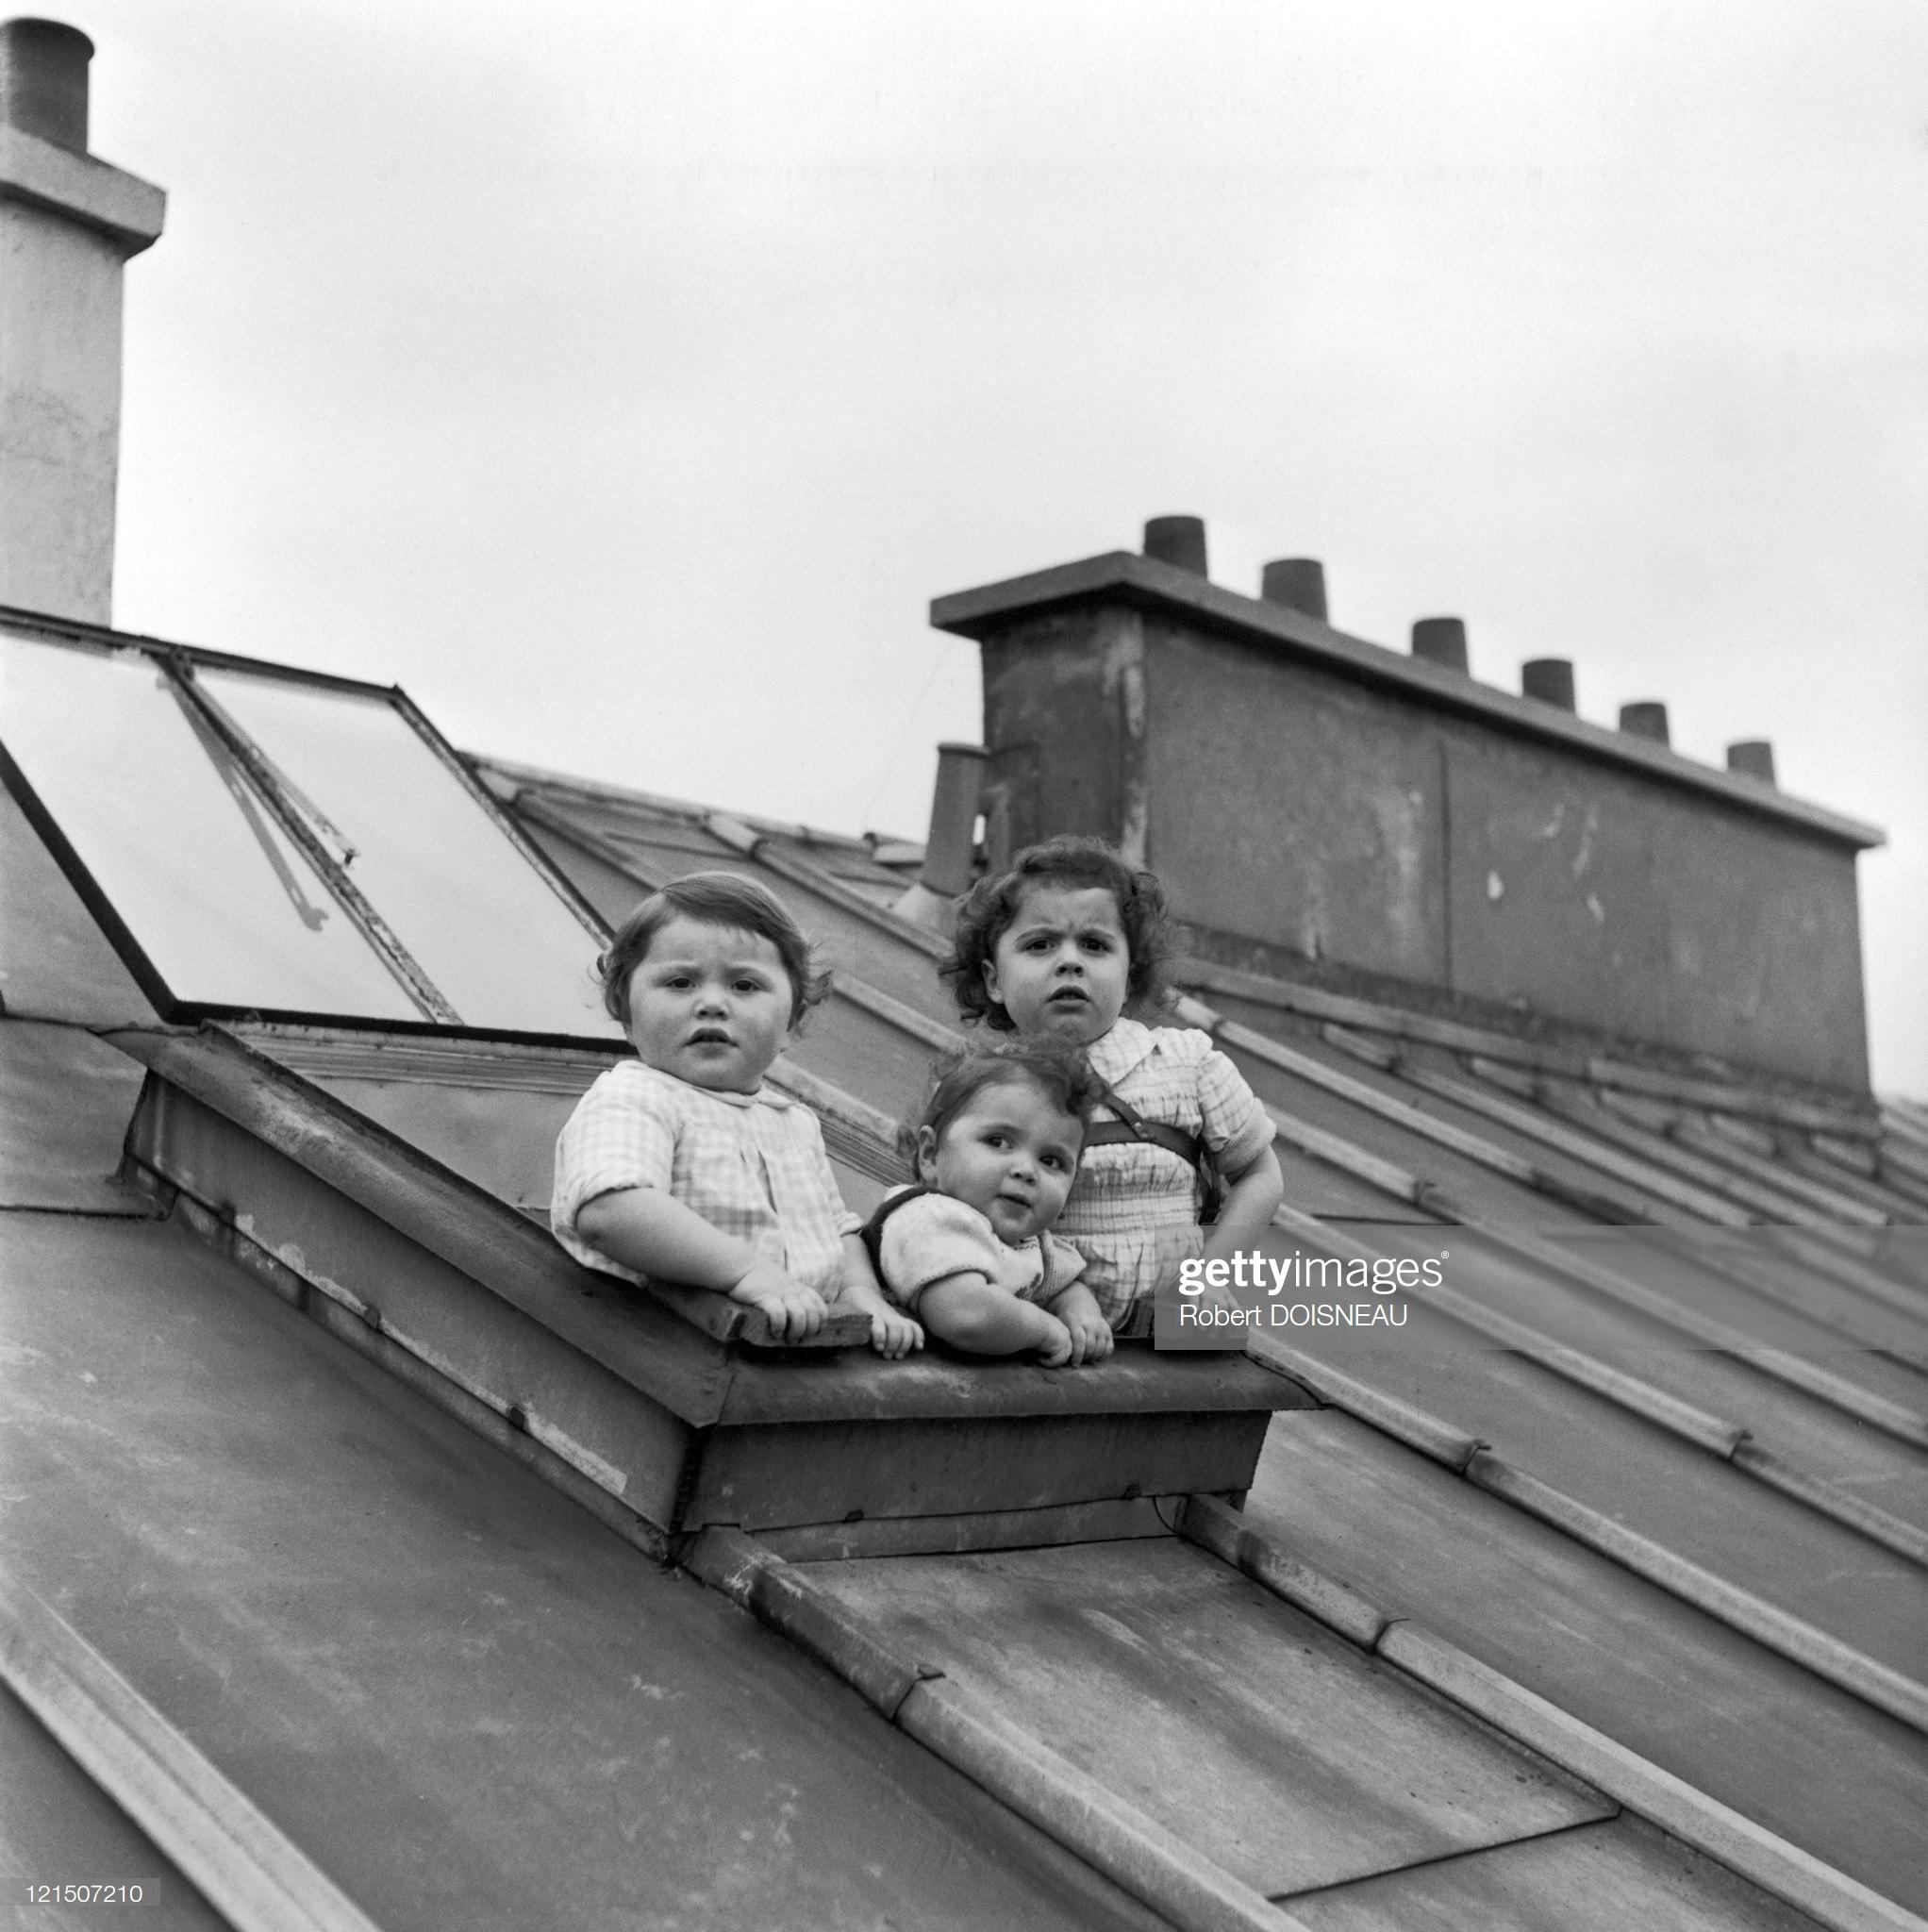 1957. Три маленьких девочки смотрят на крыши Парижа при свете фонарей